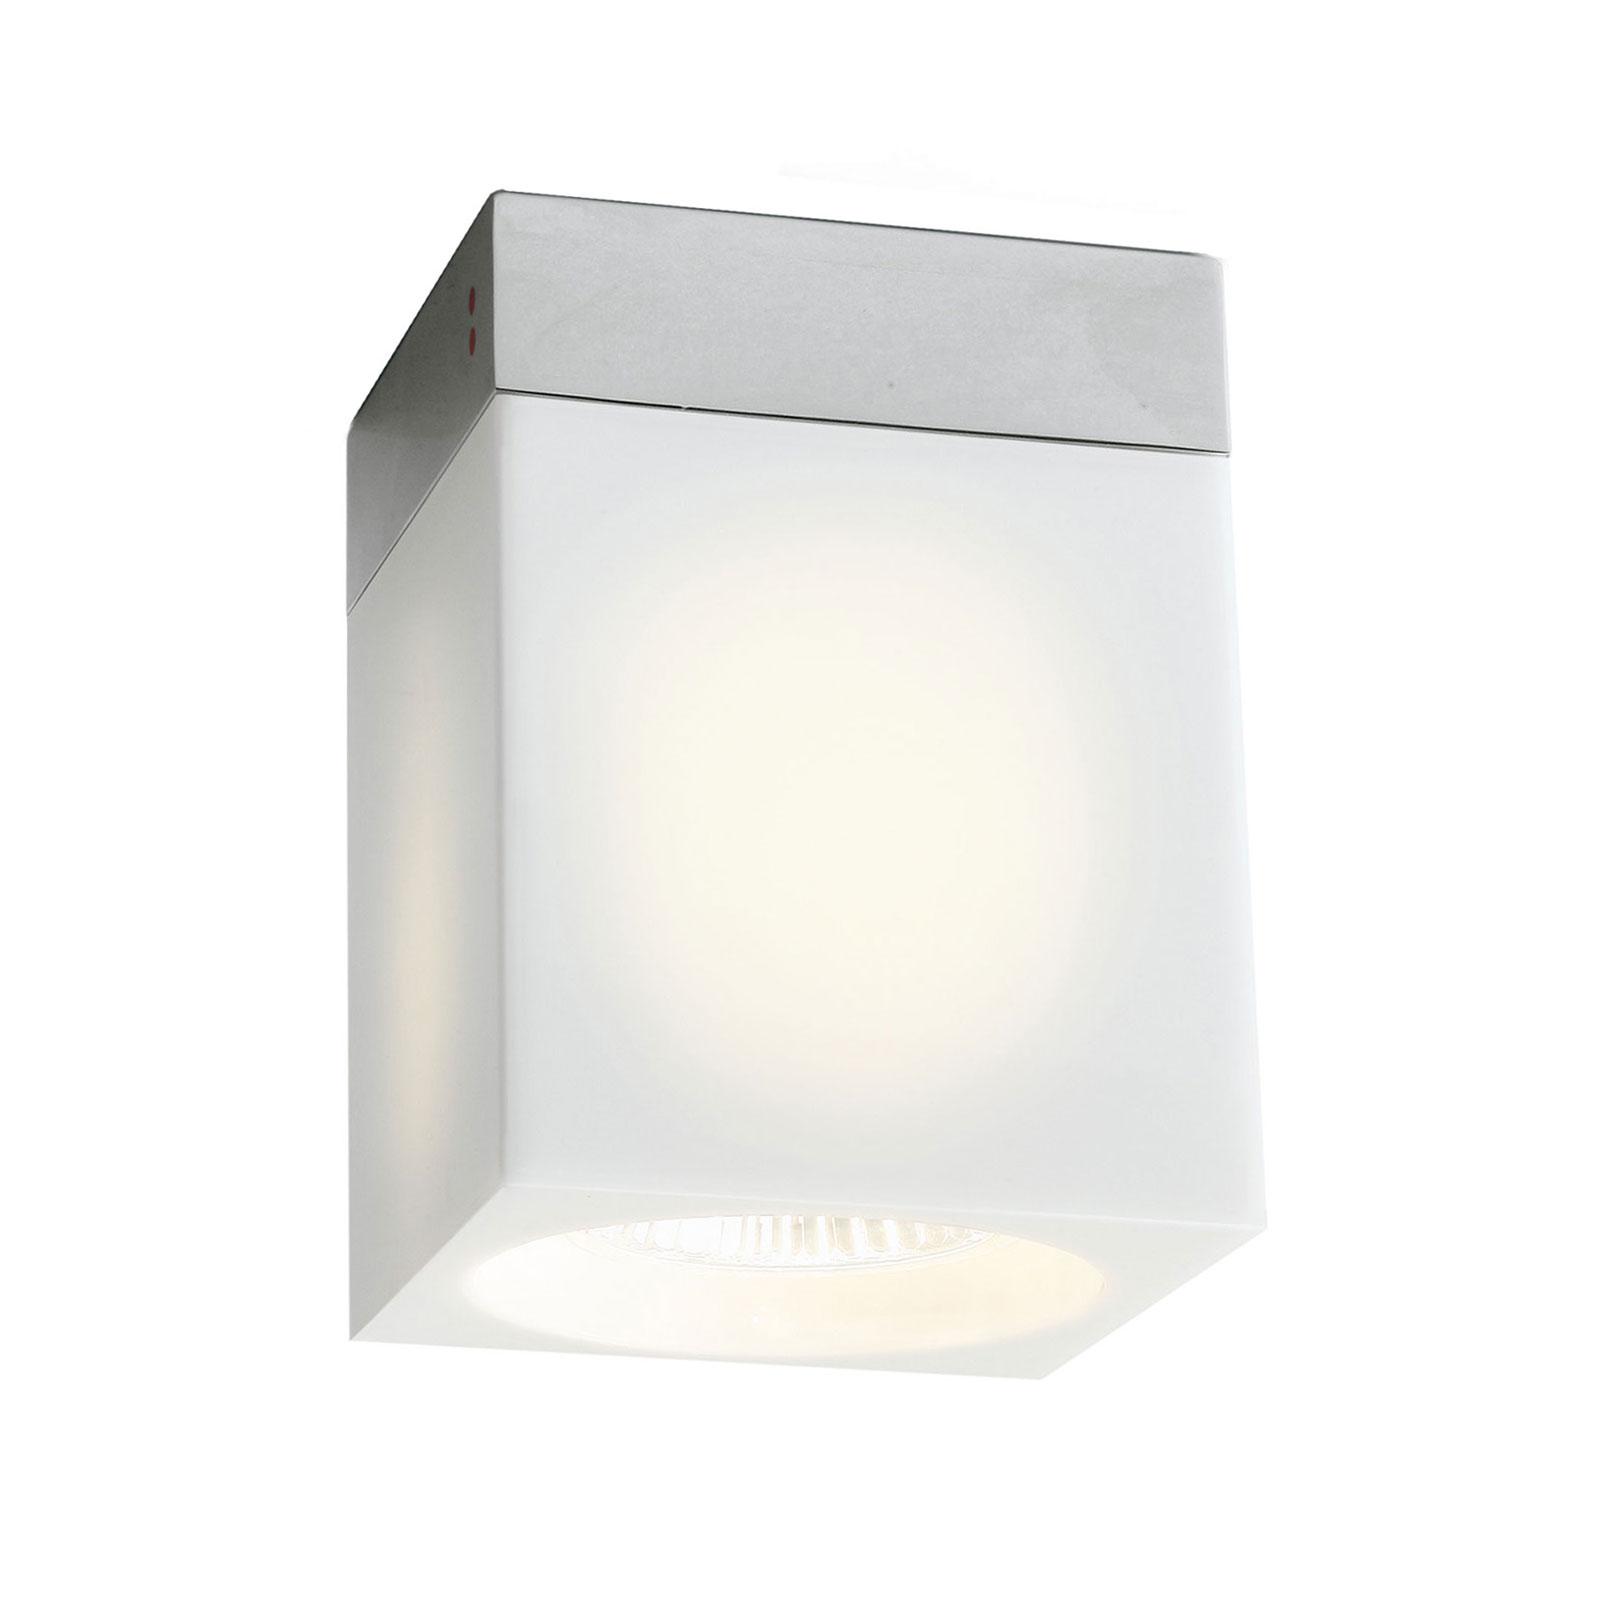 Cubetto lampa sufitowa 1-punktowa, biała